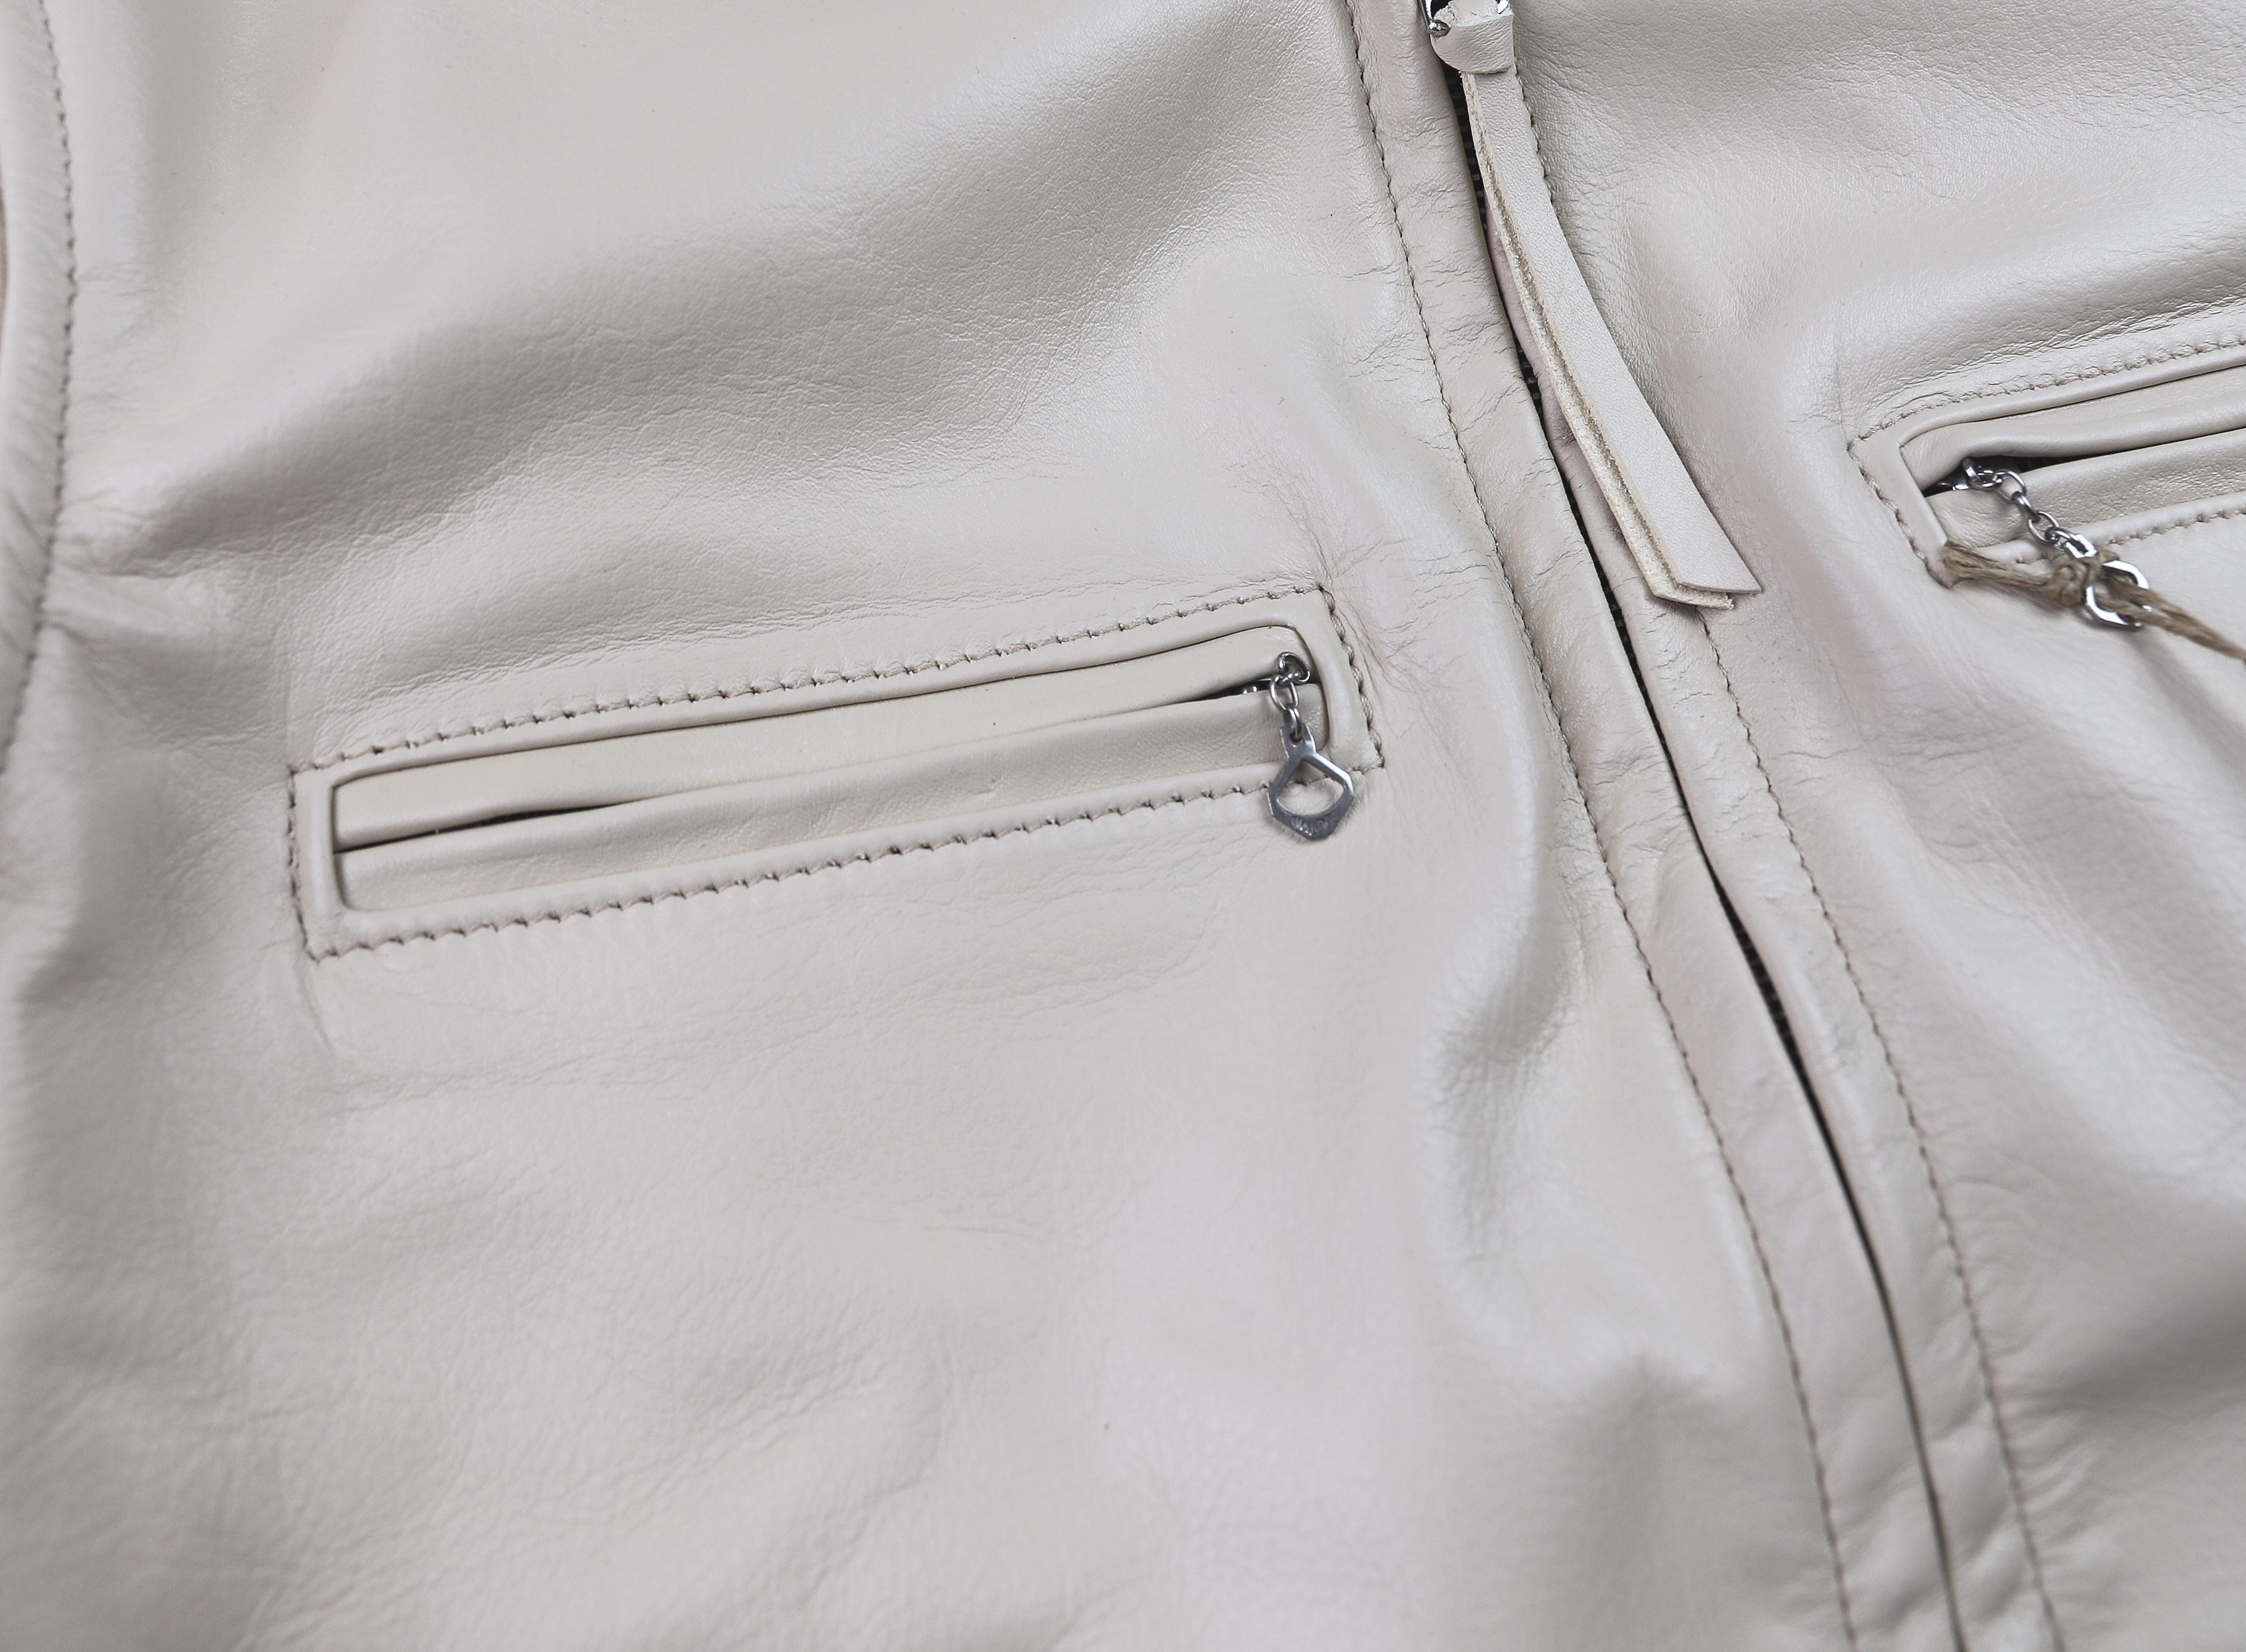 Aero Board Racer Cream Vicenza JX8 chest pockets.jpg